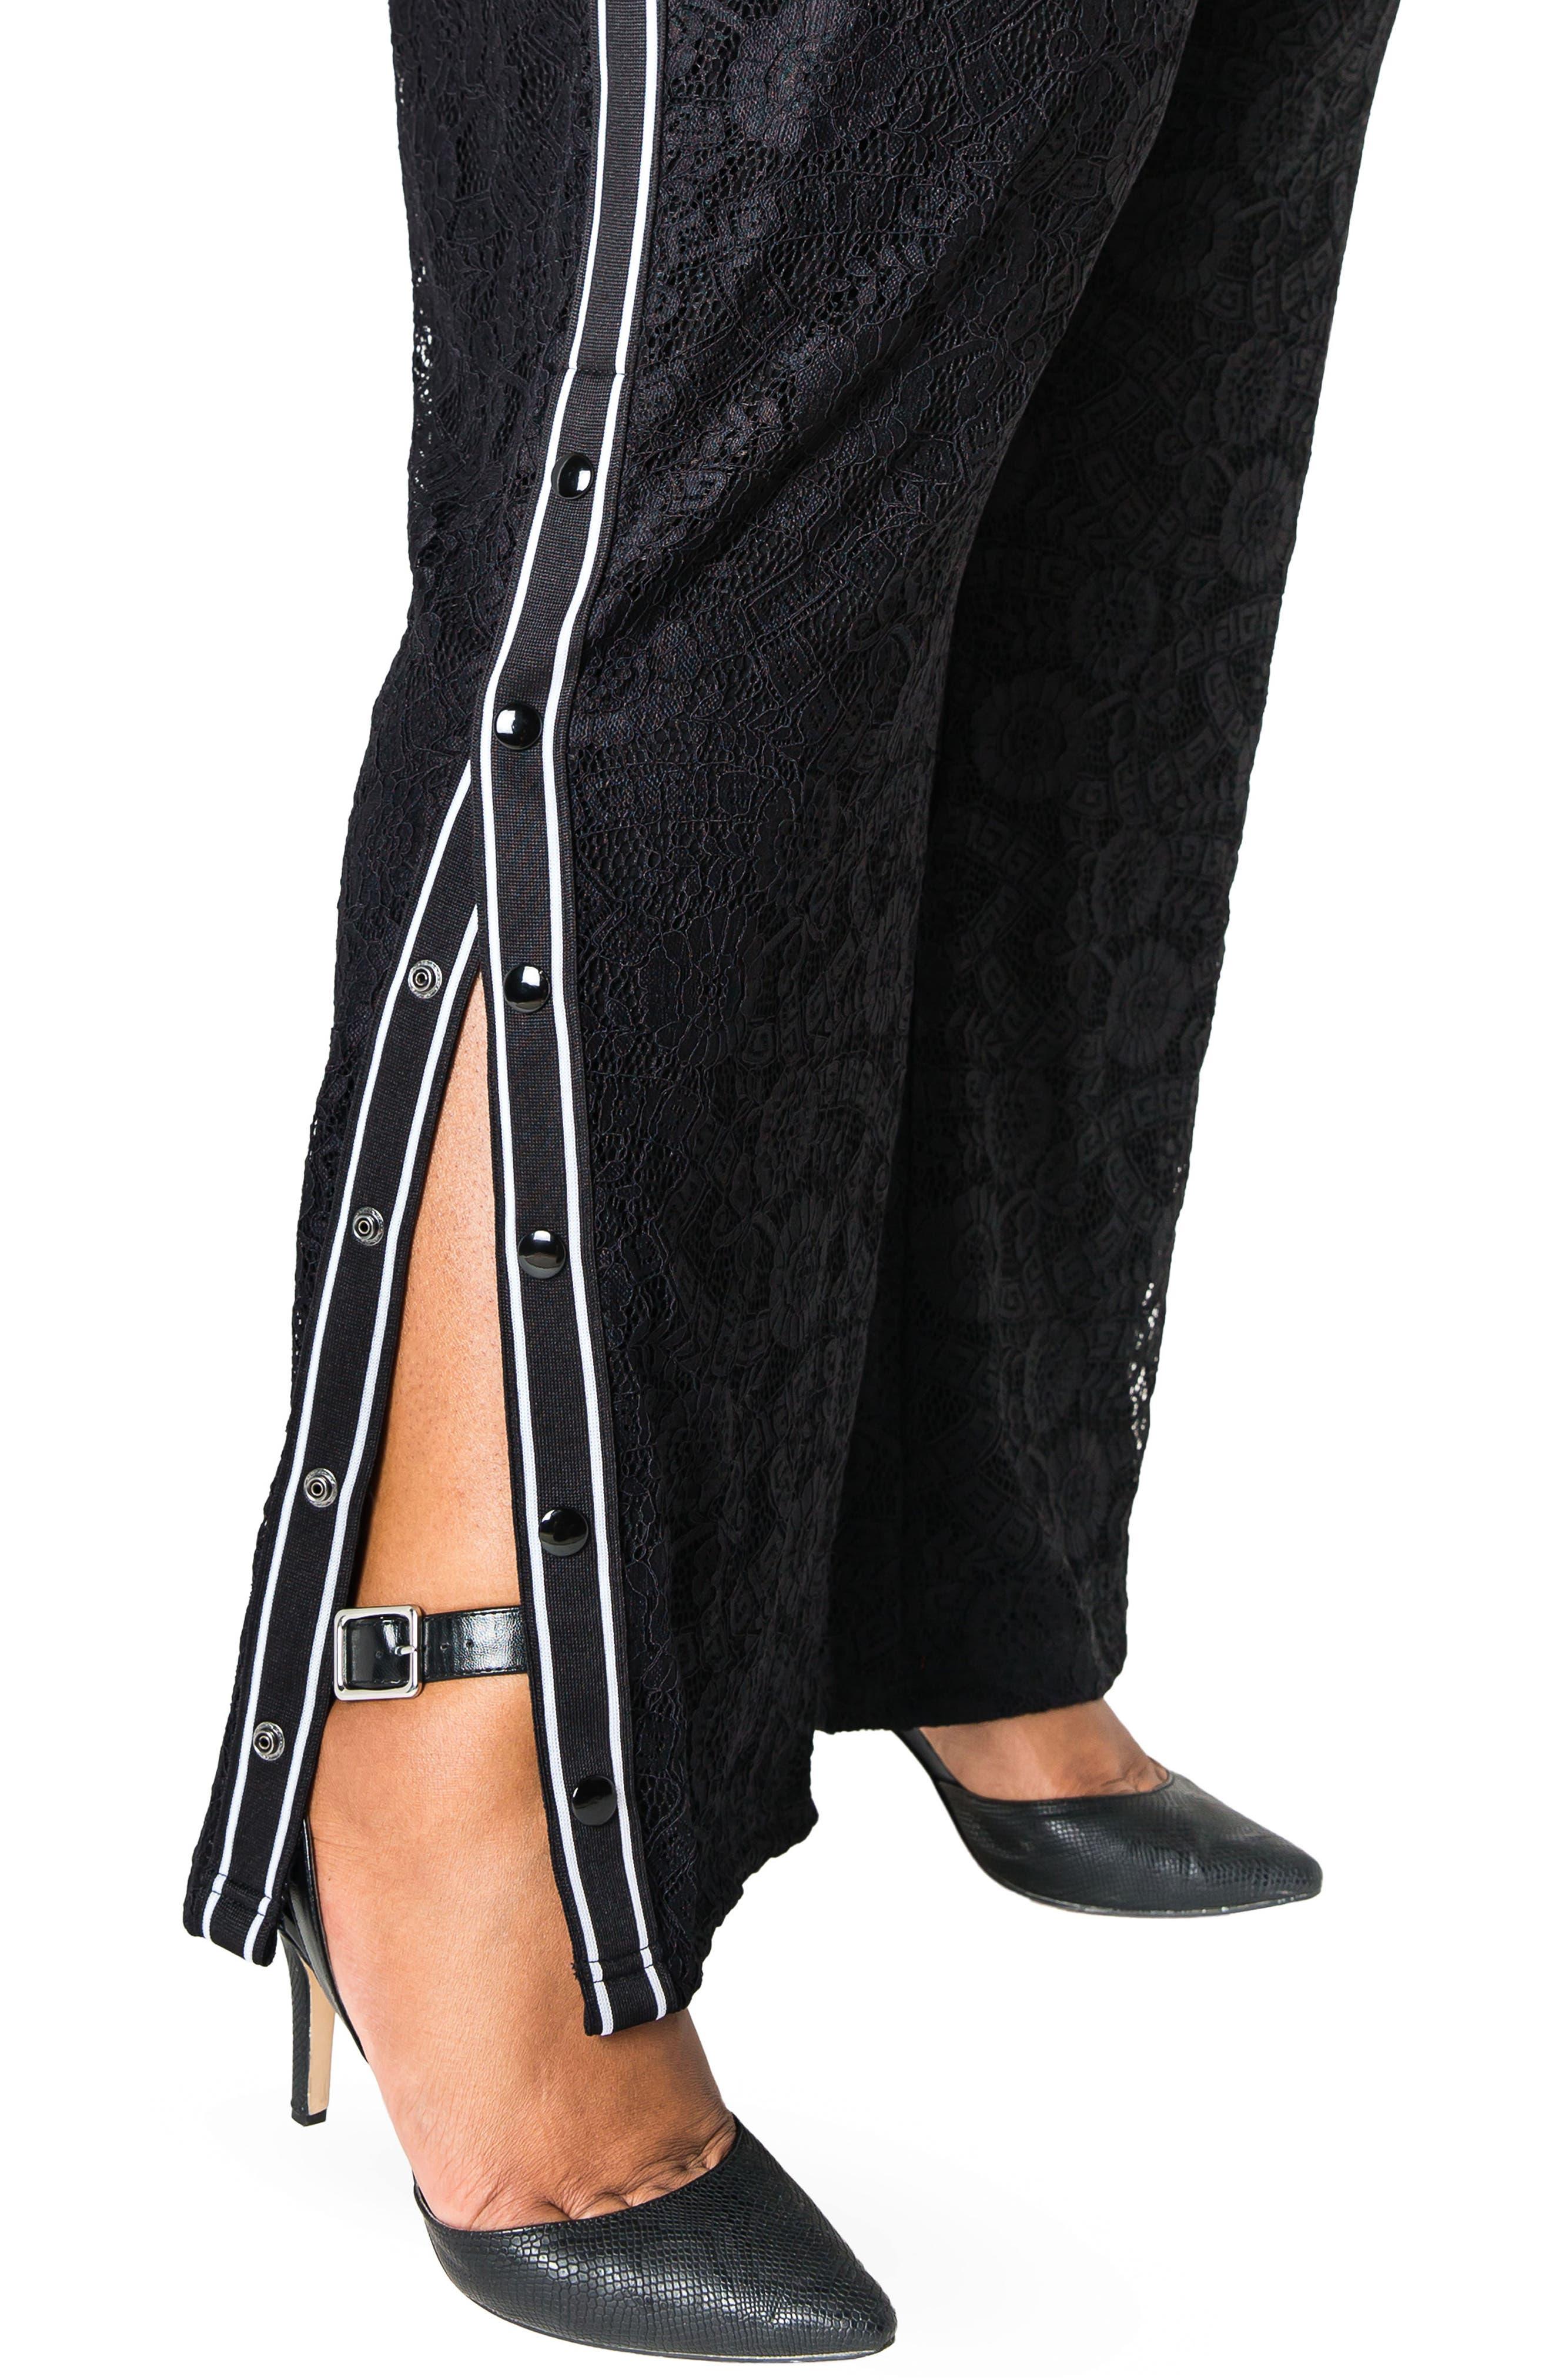 POETIC JUSTICE, Cornella High Rise Lace Knit Track Pants, Alternate thumbnail 4, color, BLACK